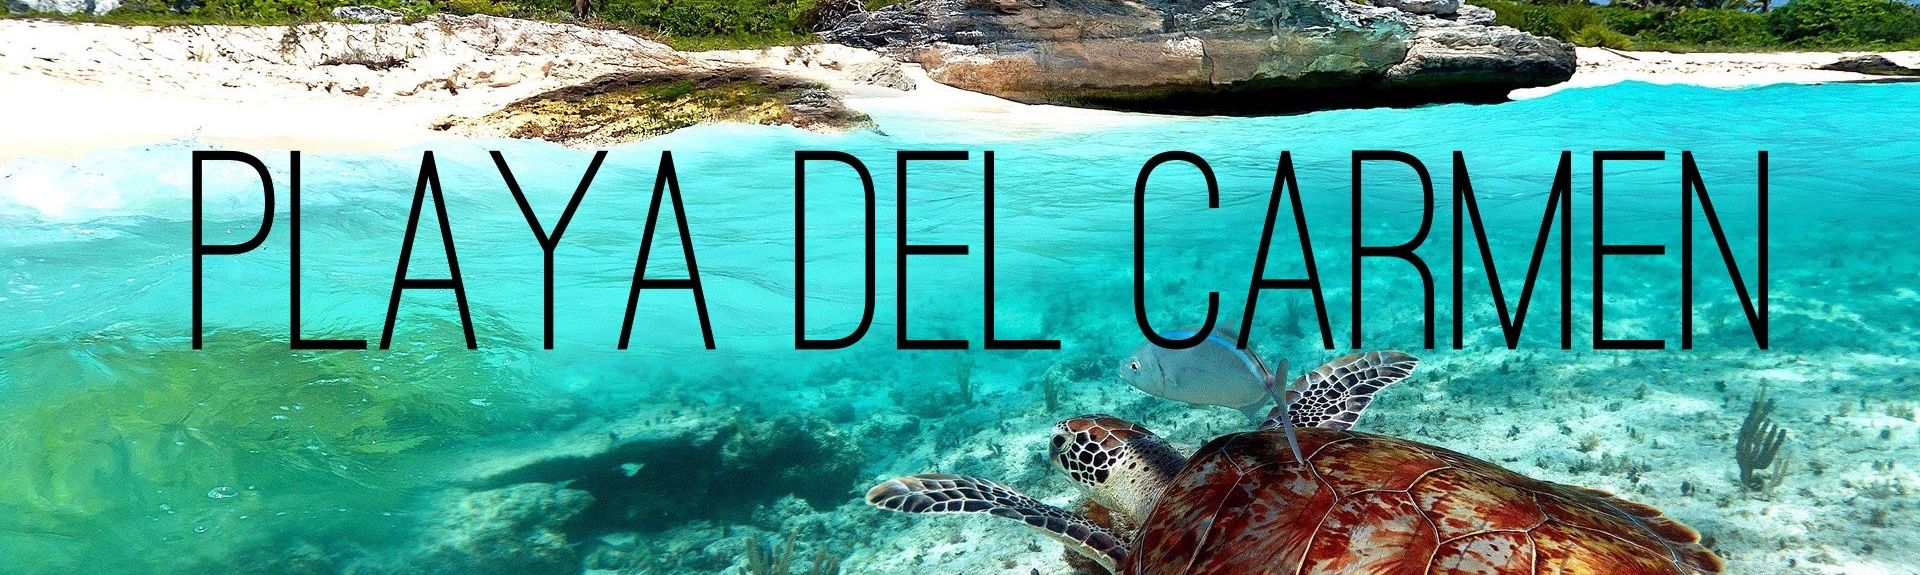 Ejidal, Playa del Carmen, Quintana Roo, Mexico